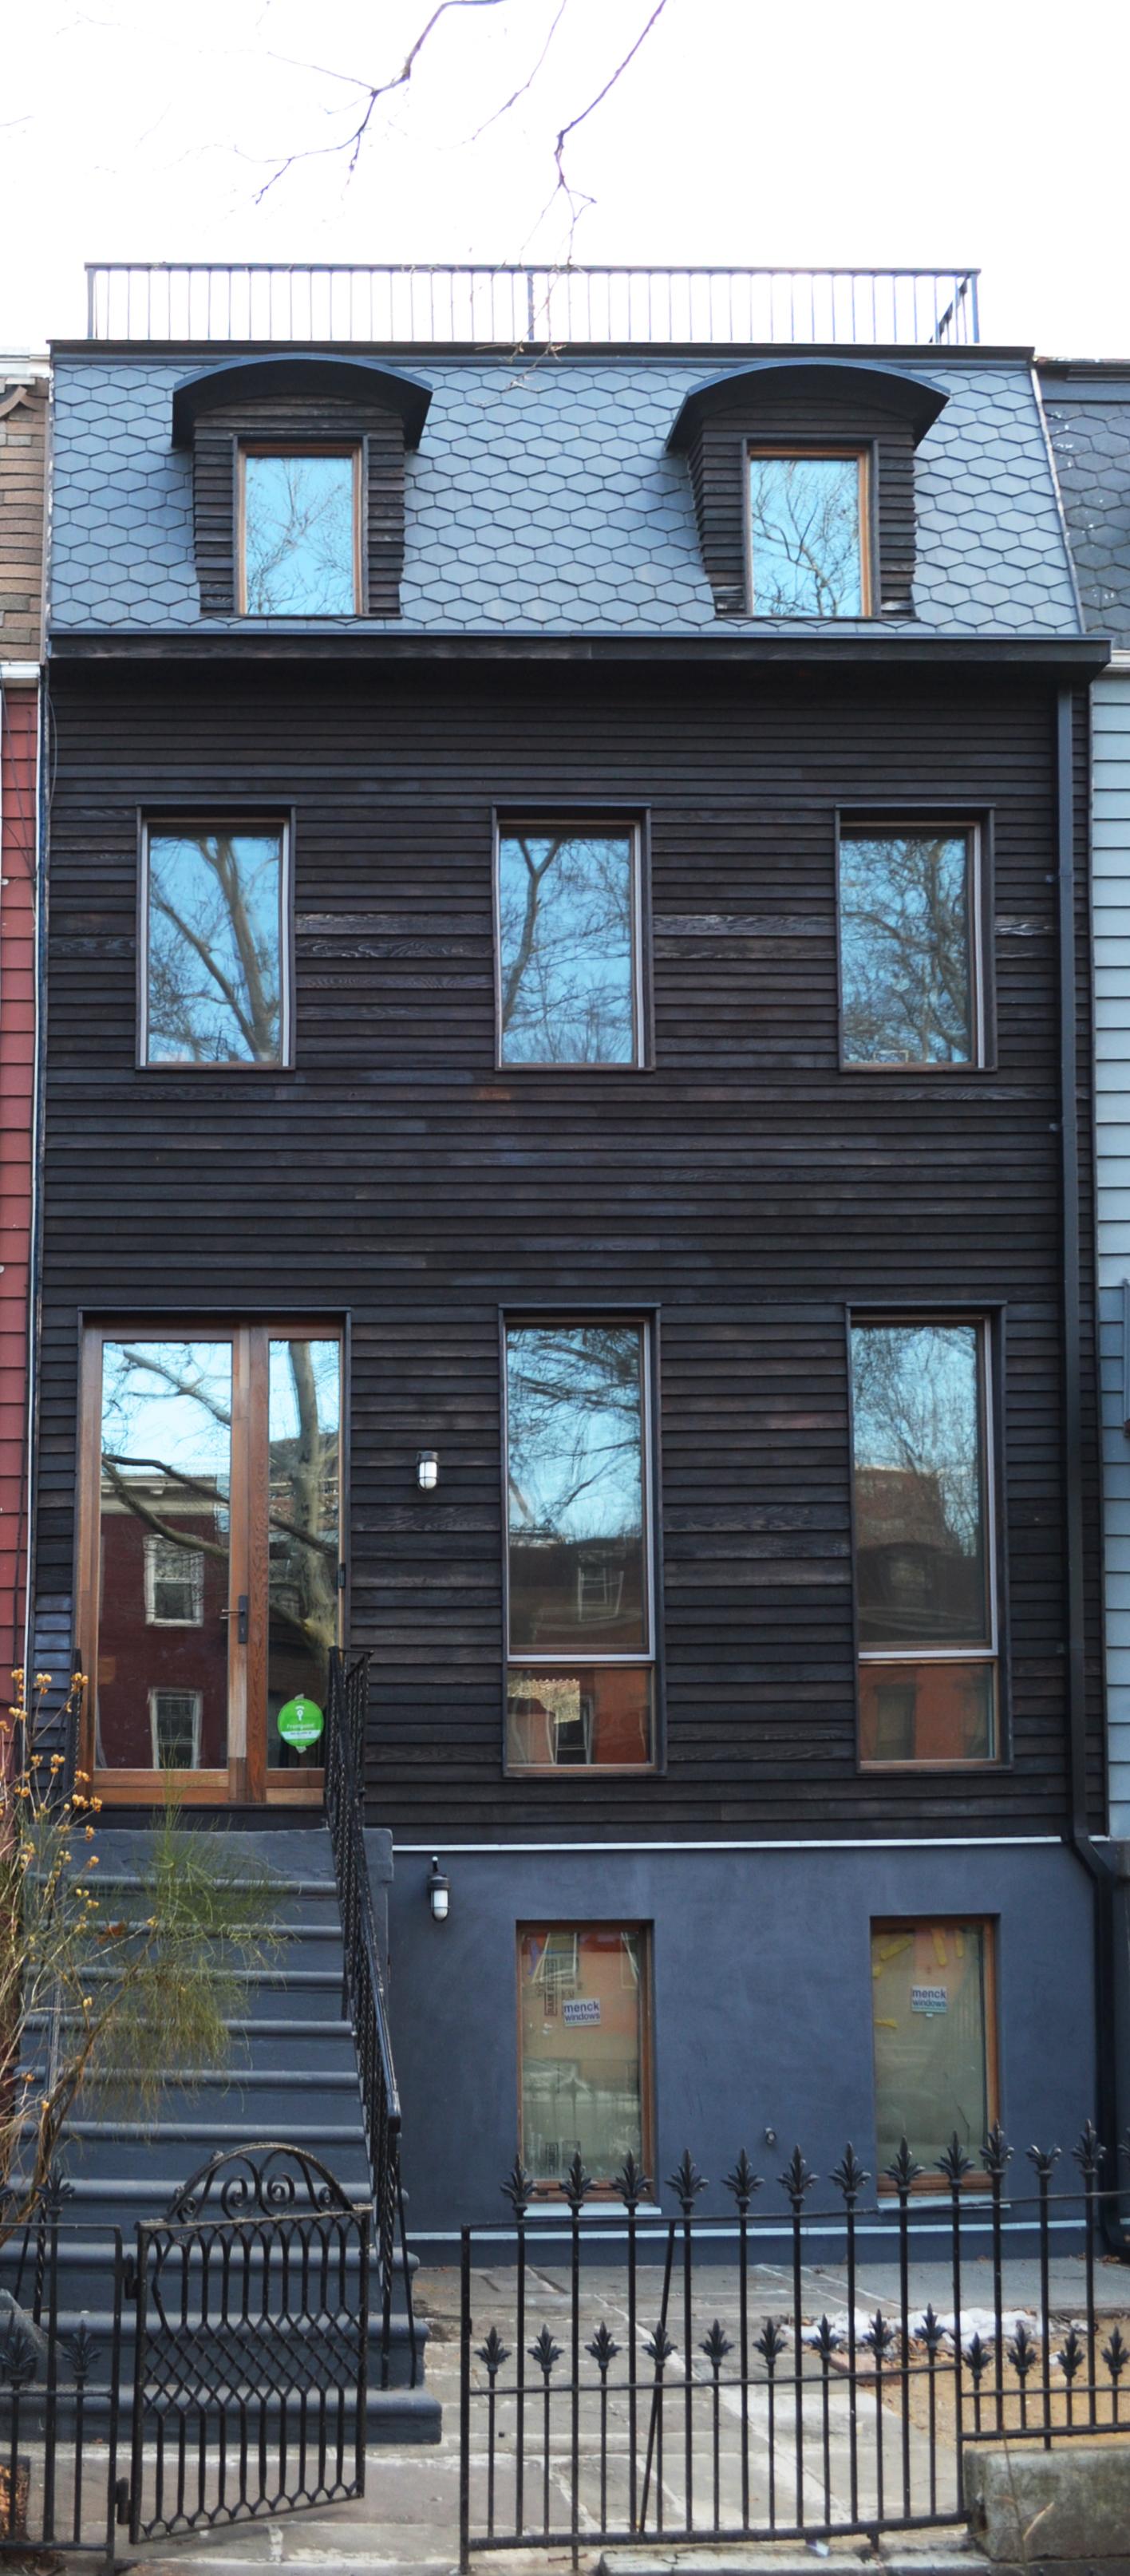 20180119_2343 winter front facade croped.jpg